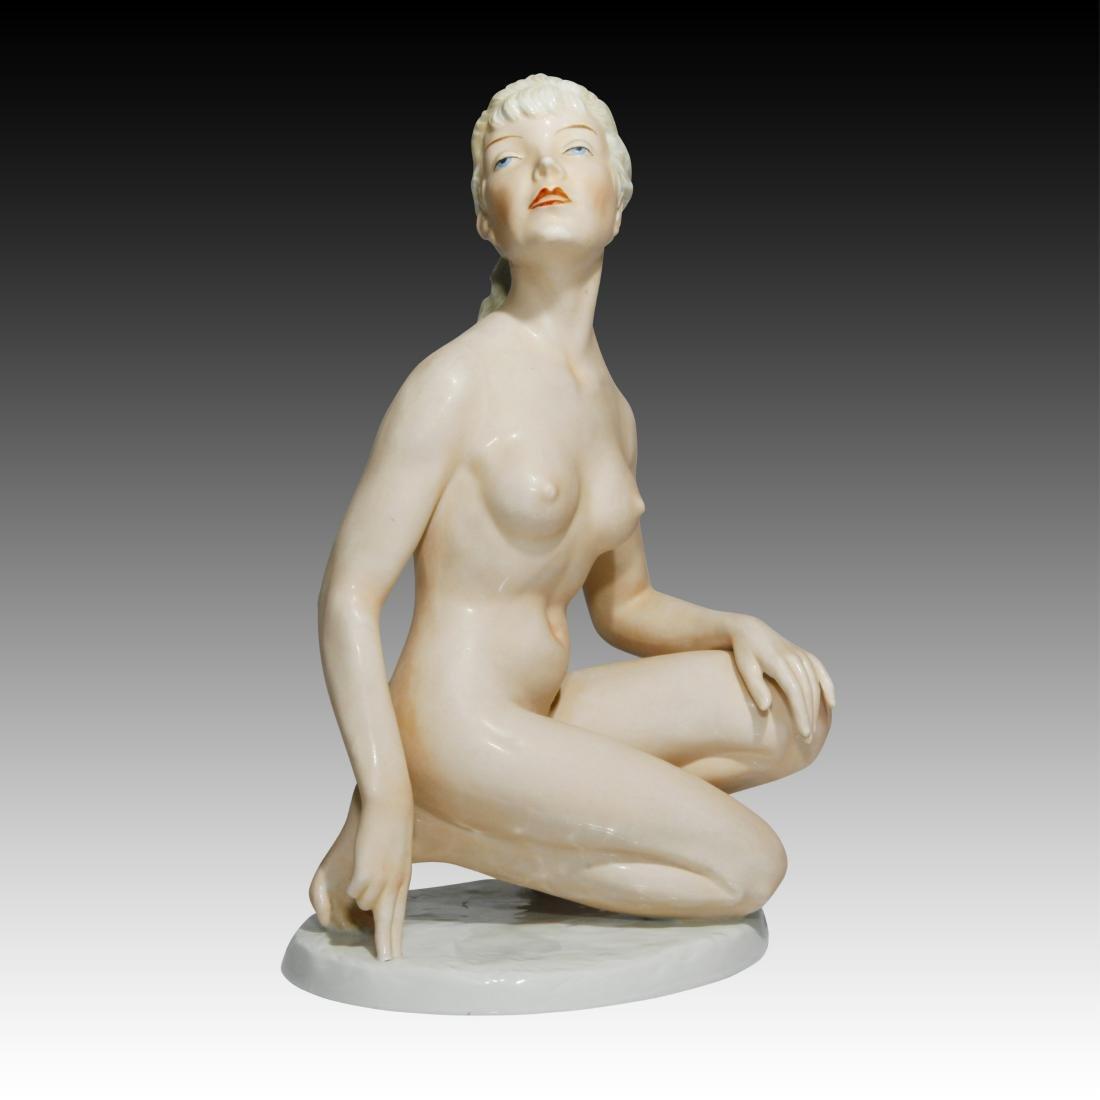 Shaubach Kunst Kneeling Blonde Figurine 9365